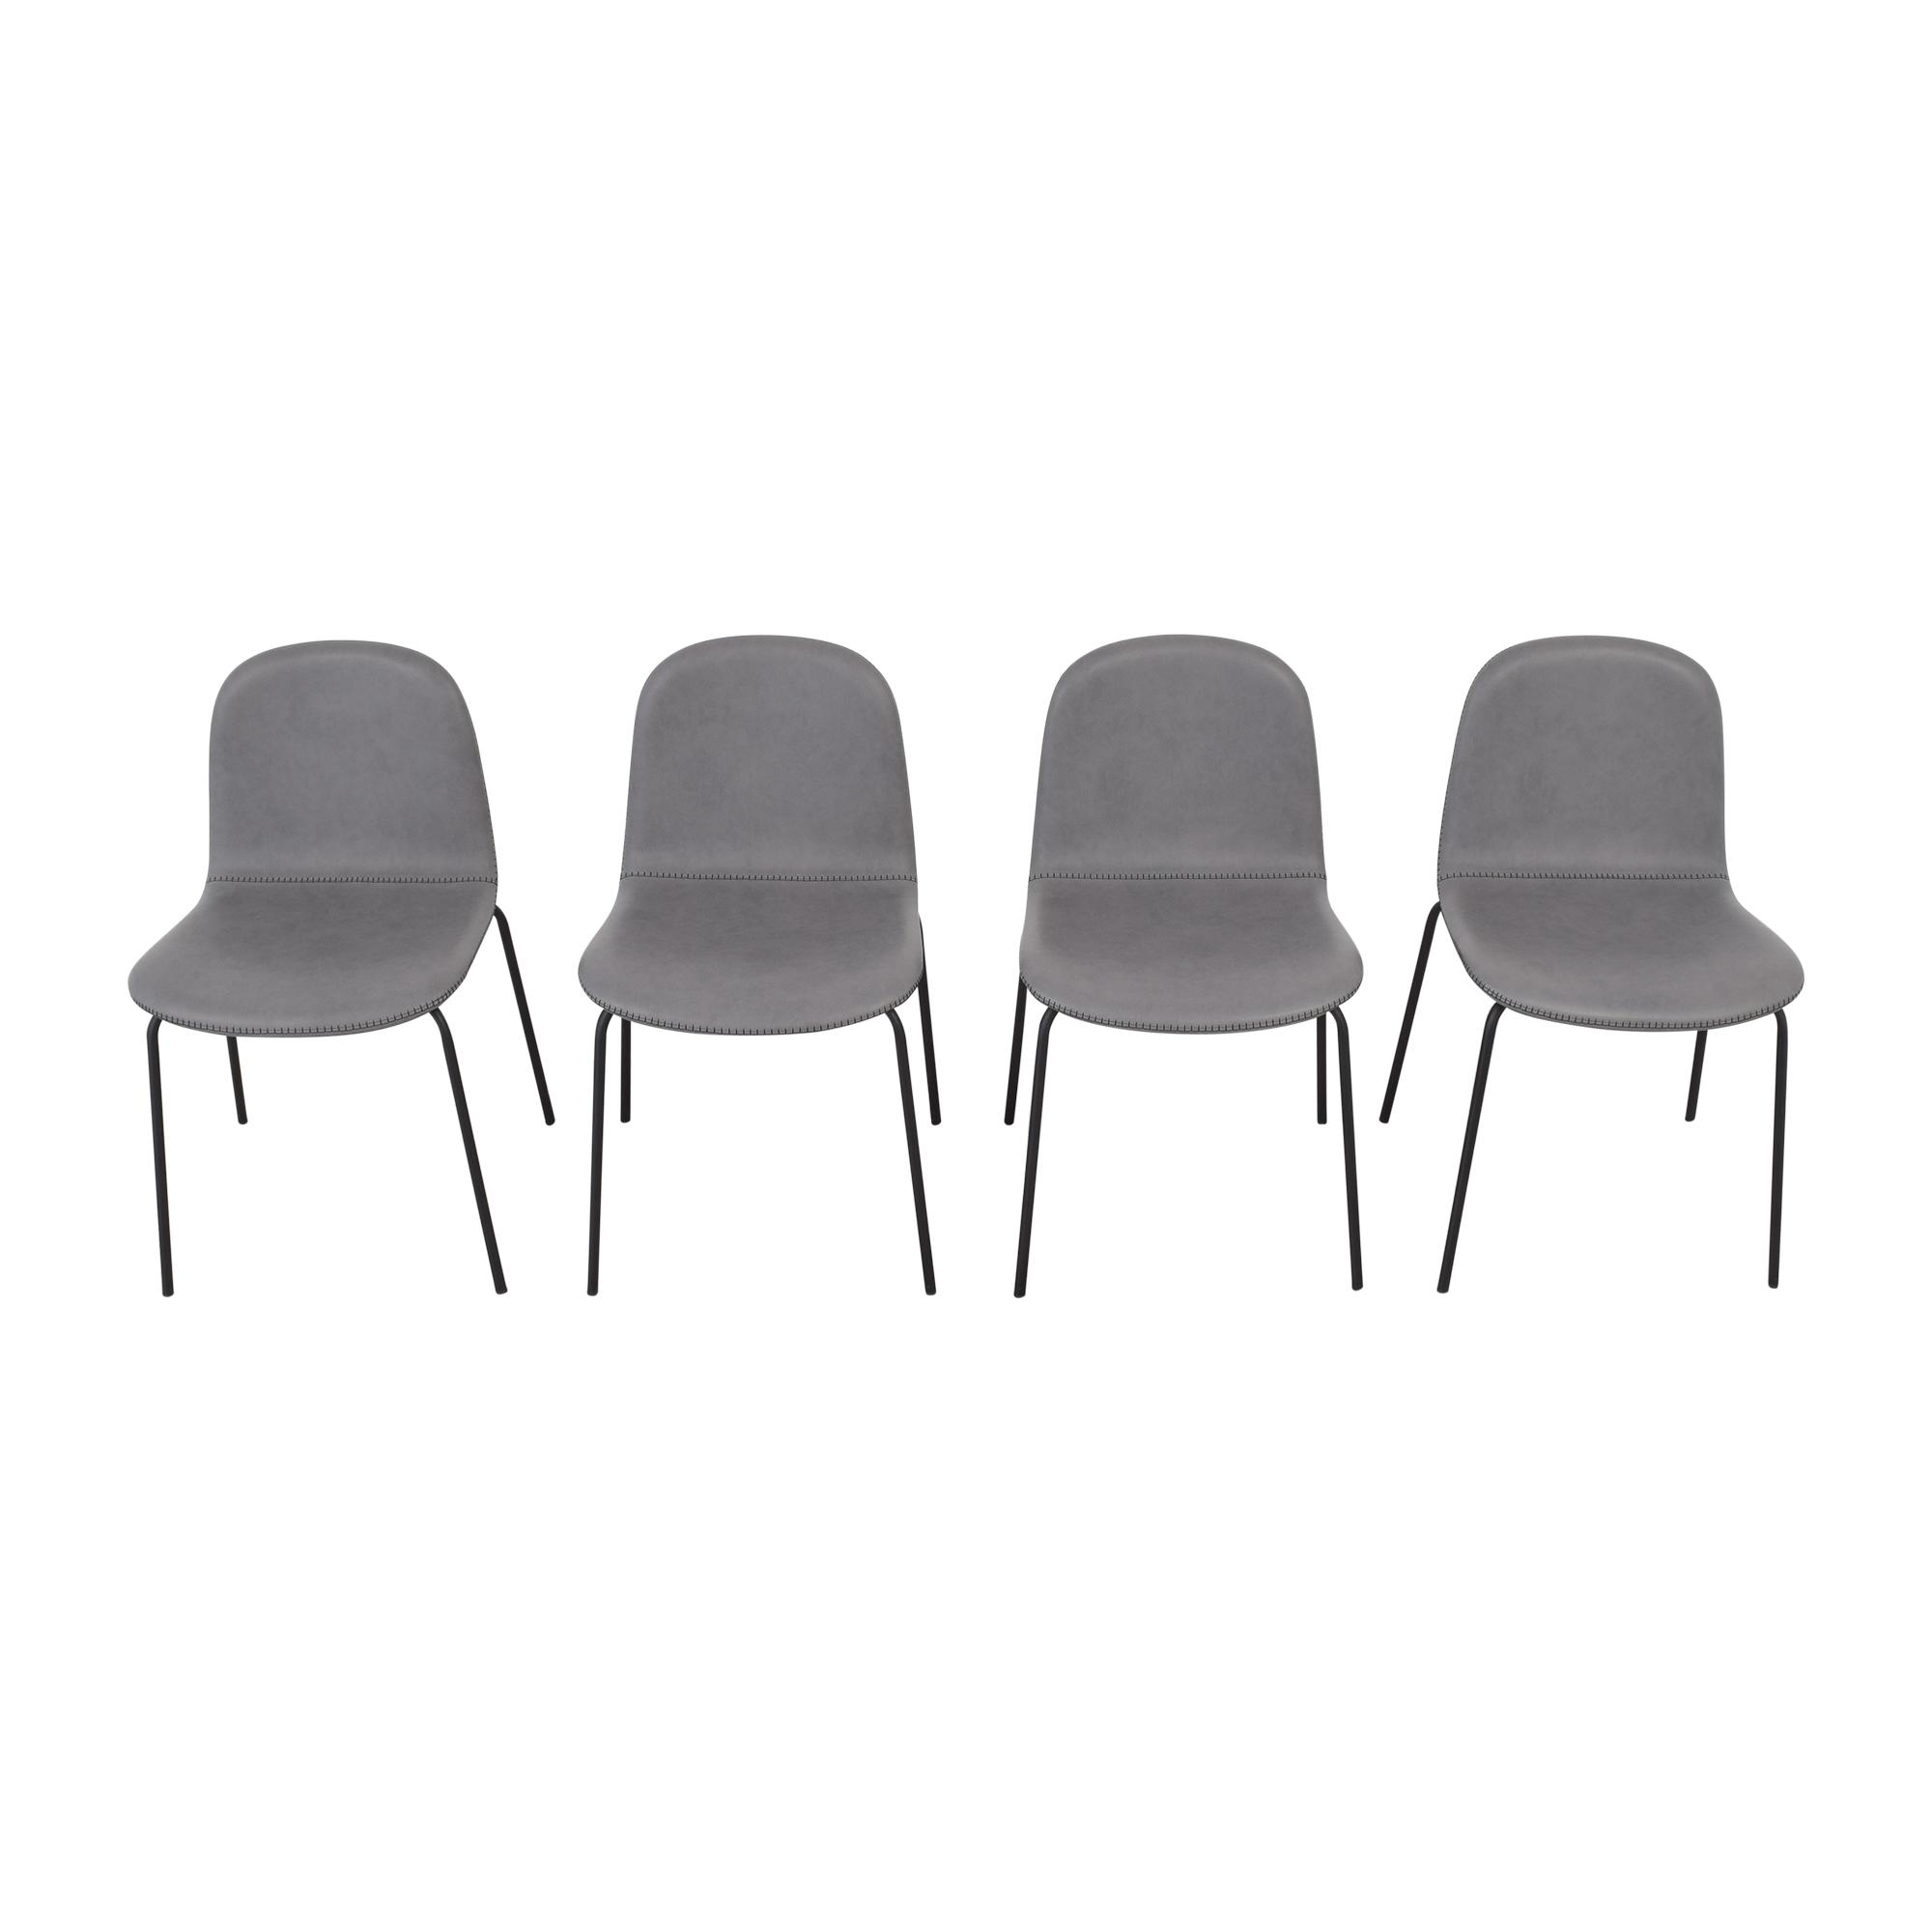 CB2 CB2 Primitivo Grey Chairs used